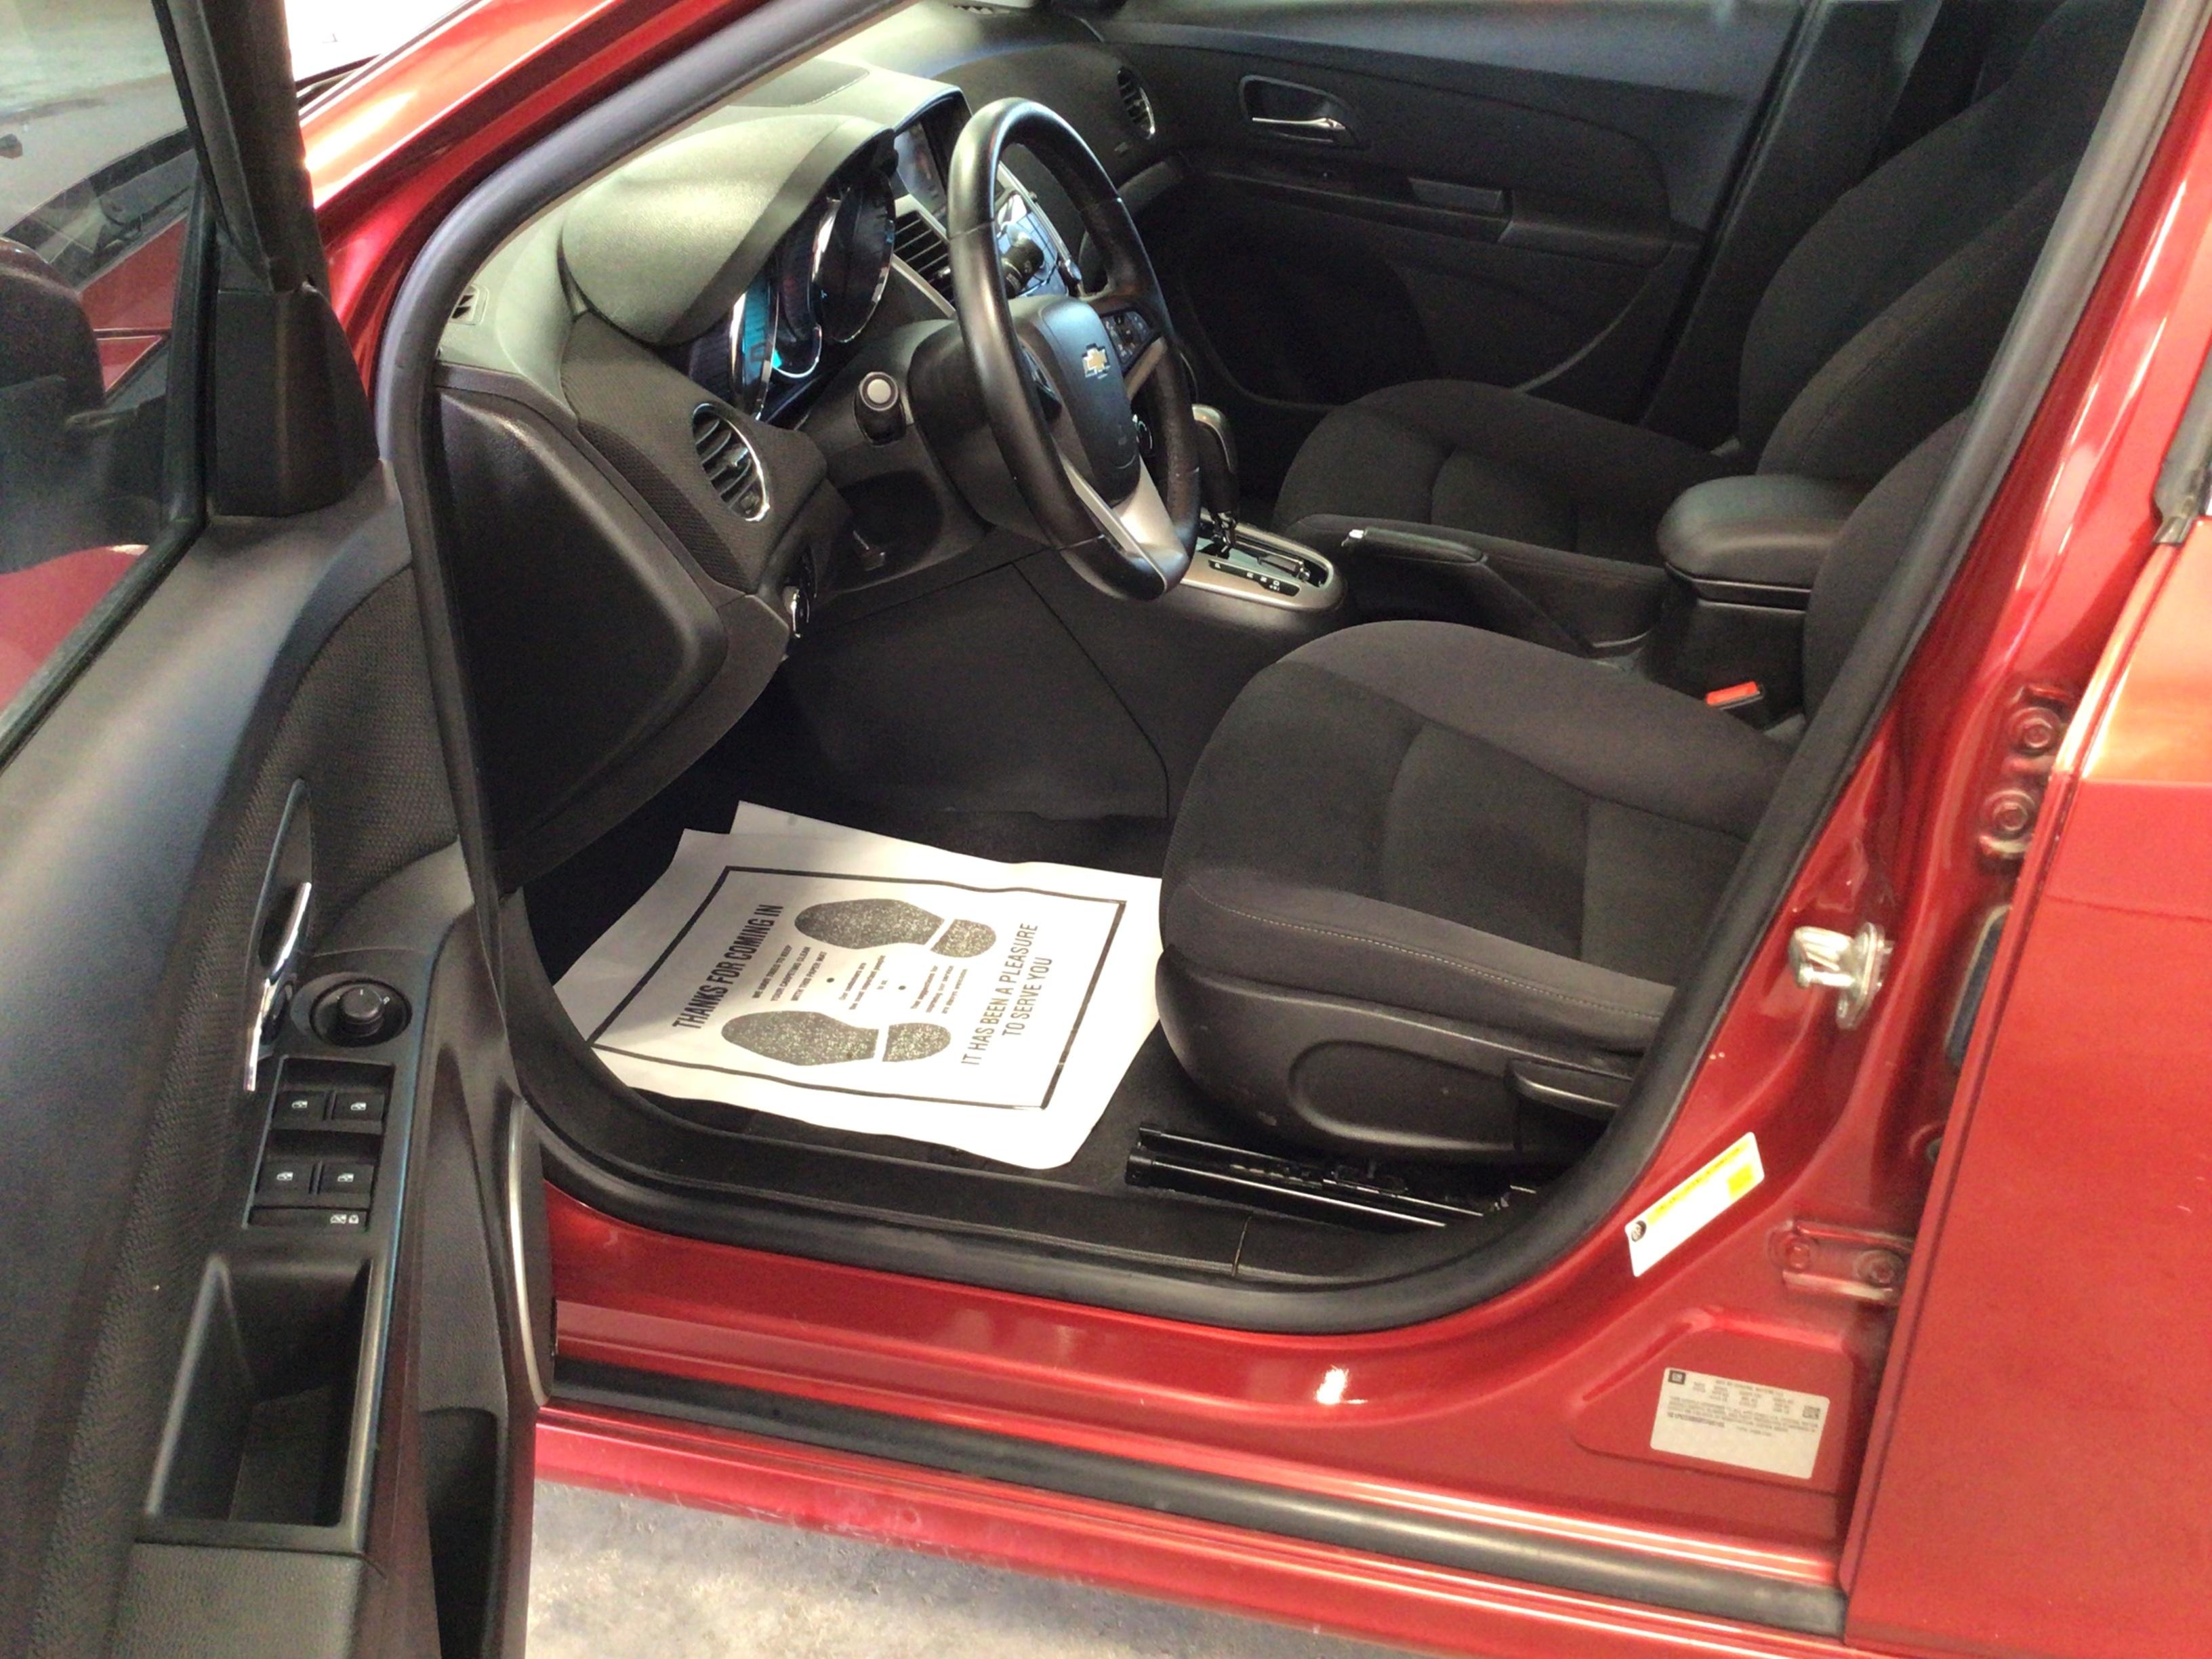 used vehicle - Sedan CHEVROLET CRUZE 2013